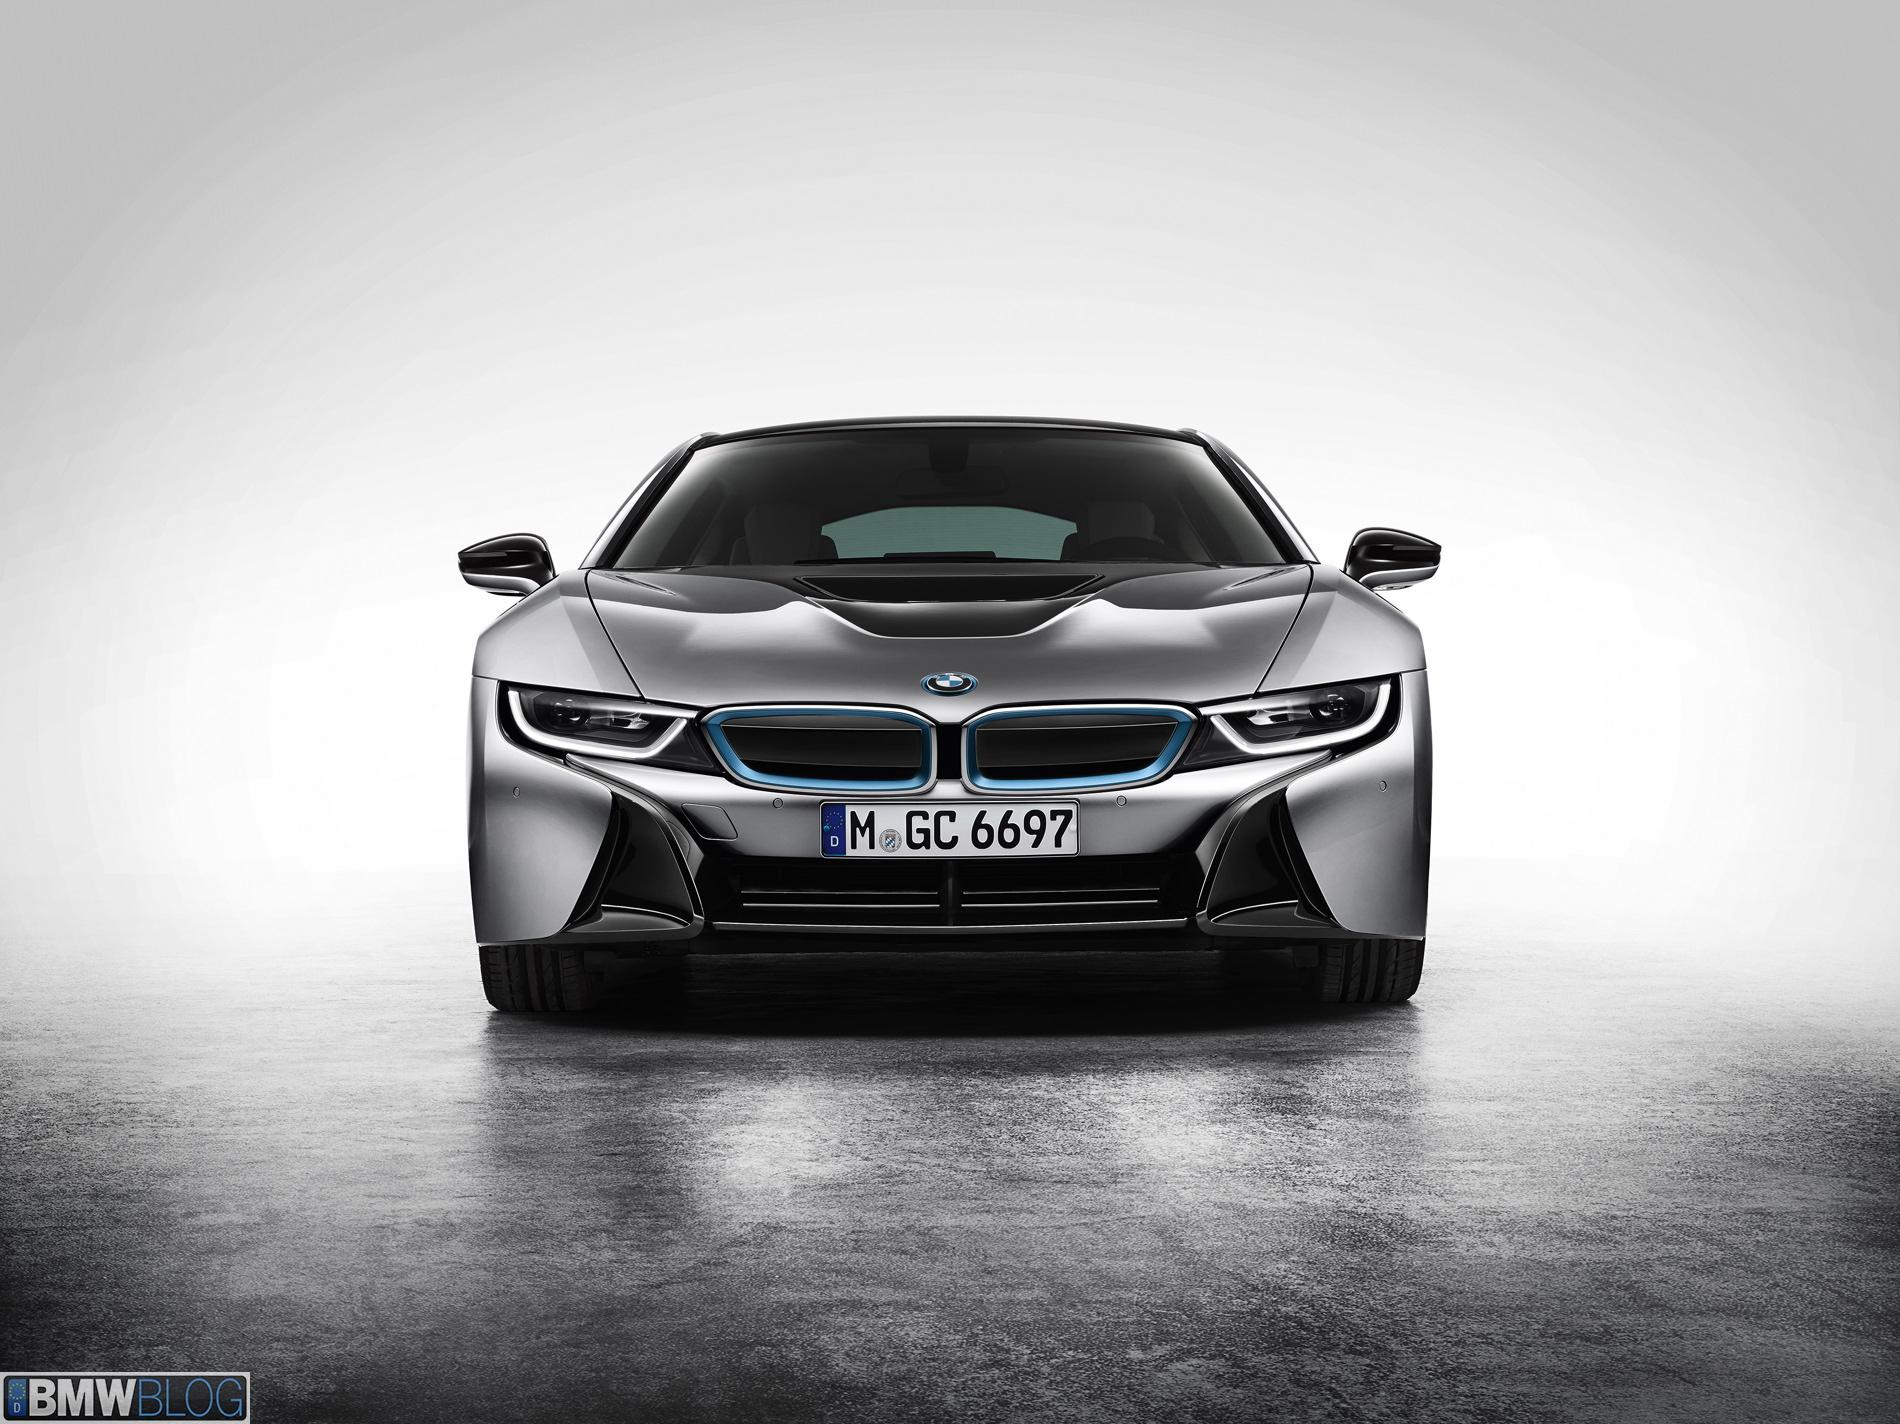 2014 BMW i8 Price $135,700